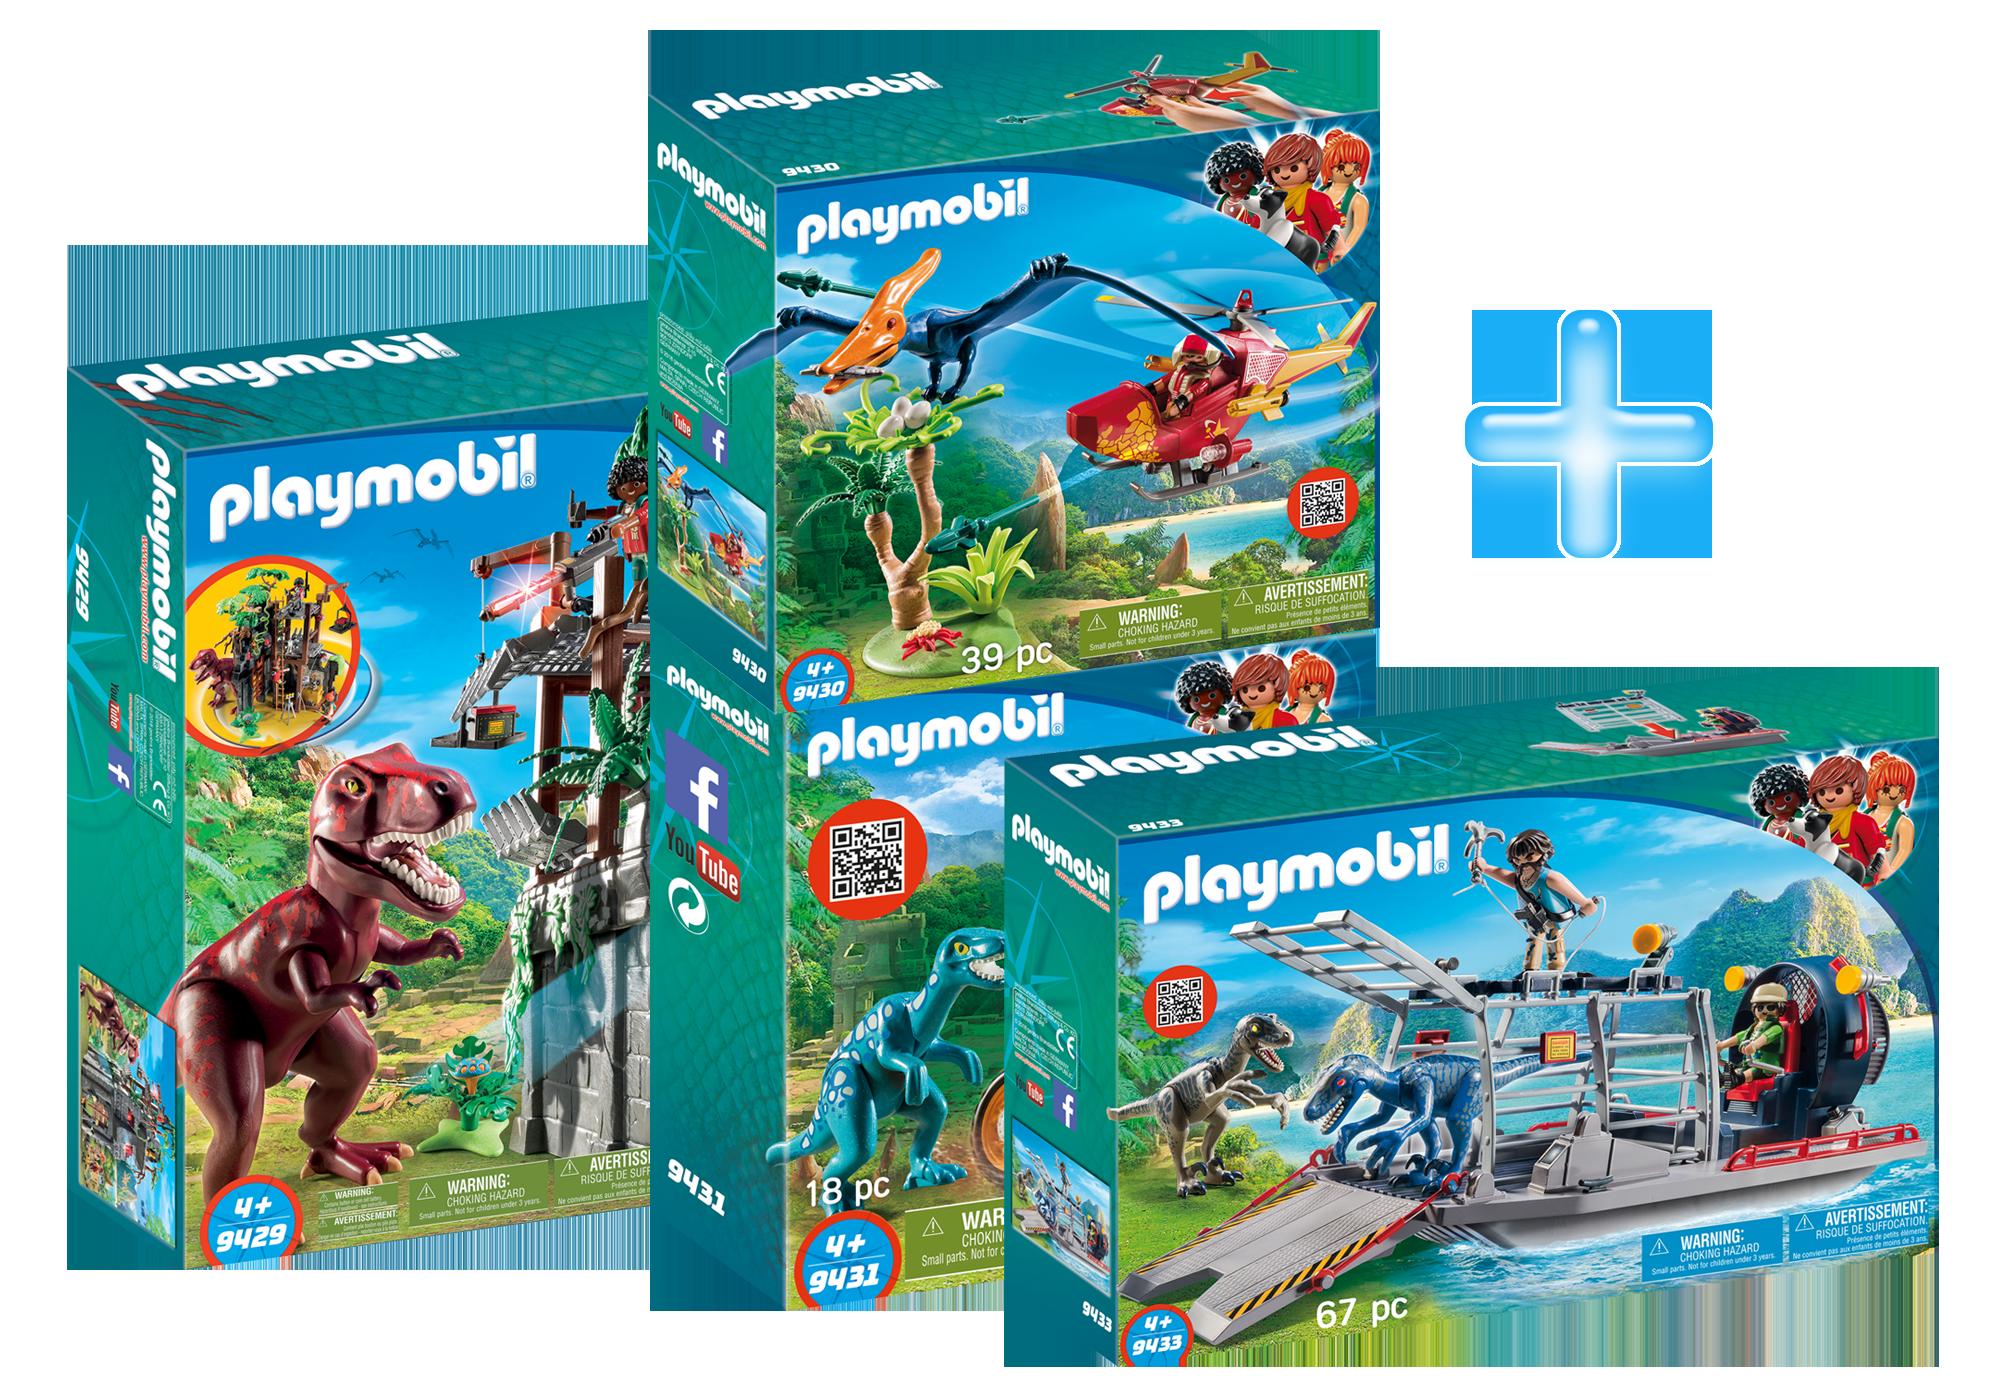 http://media.playmobil.com/i/playmobil/CA1903A_product_detail